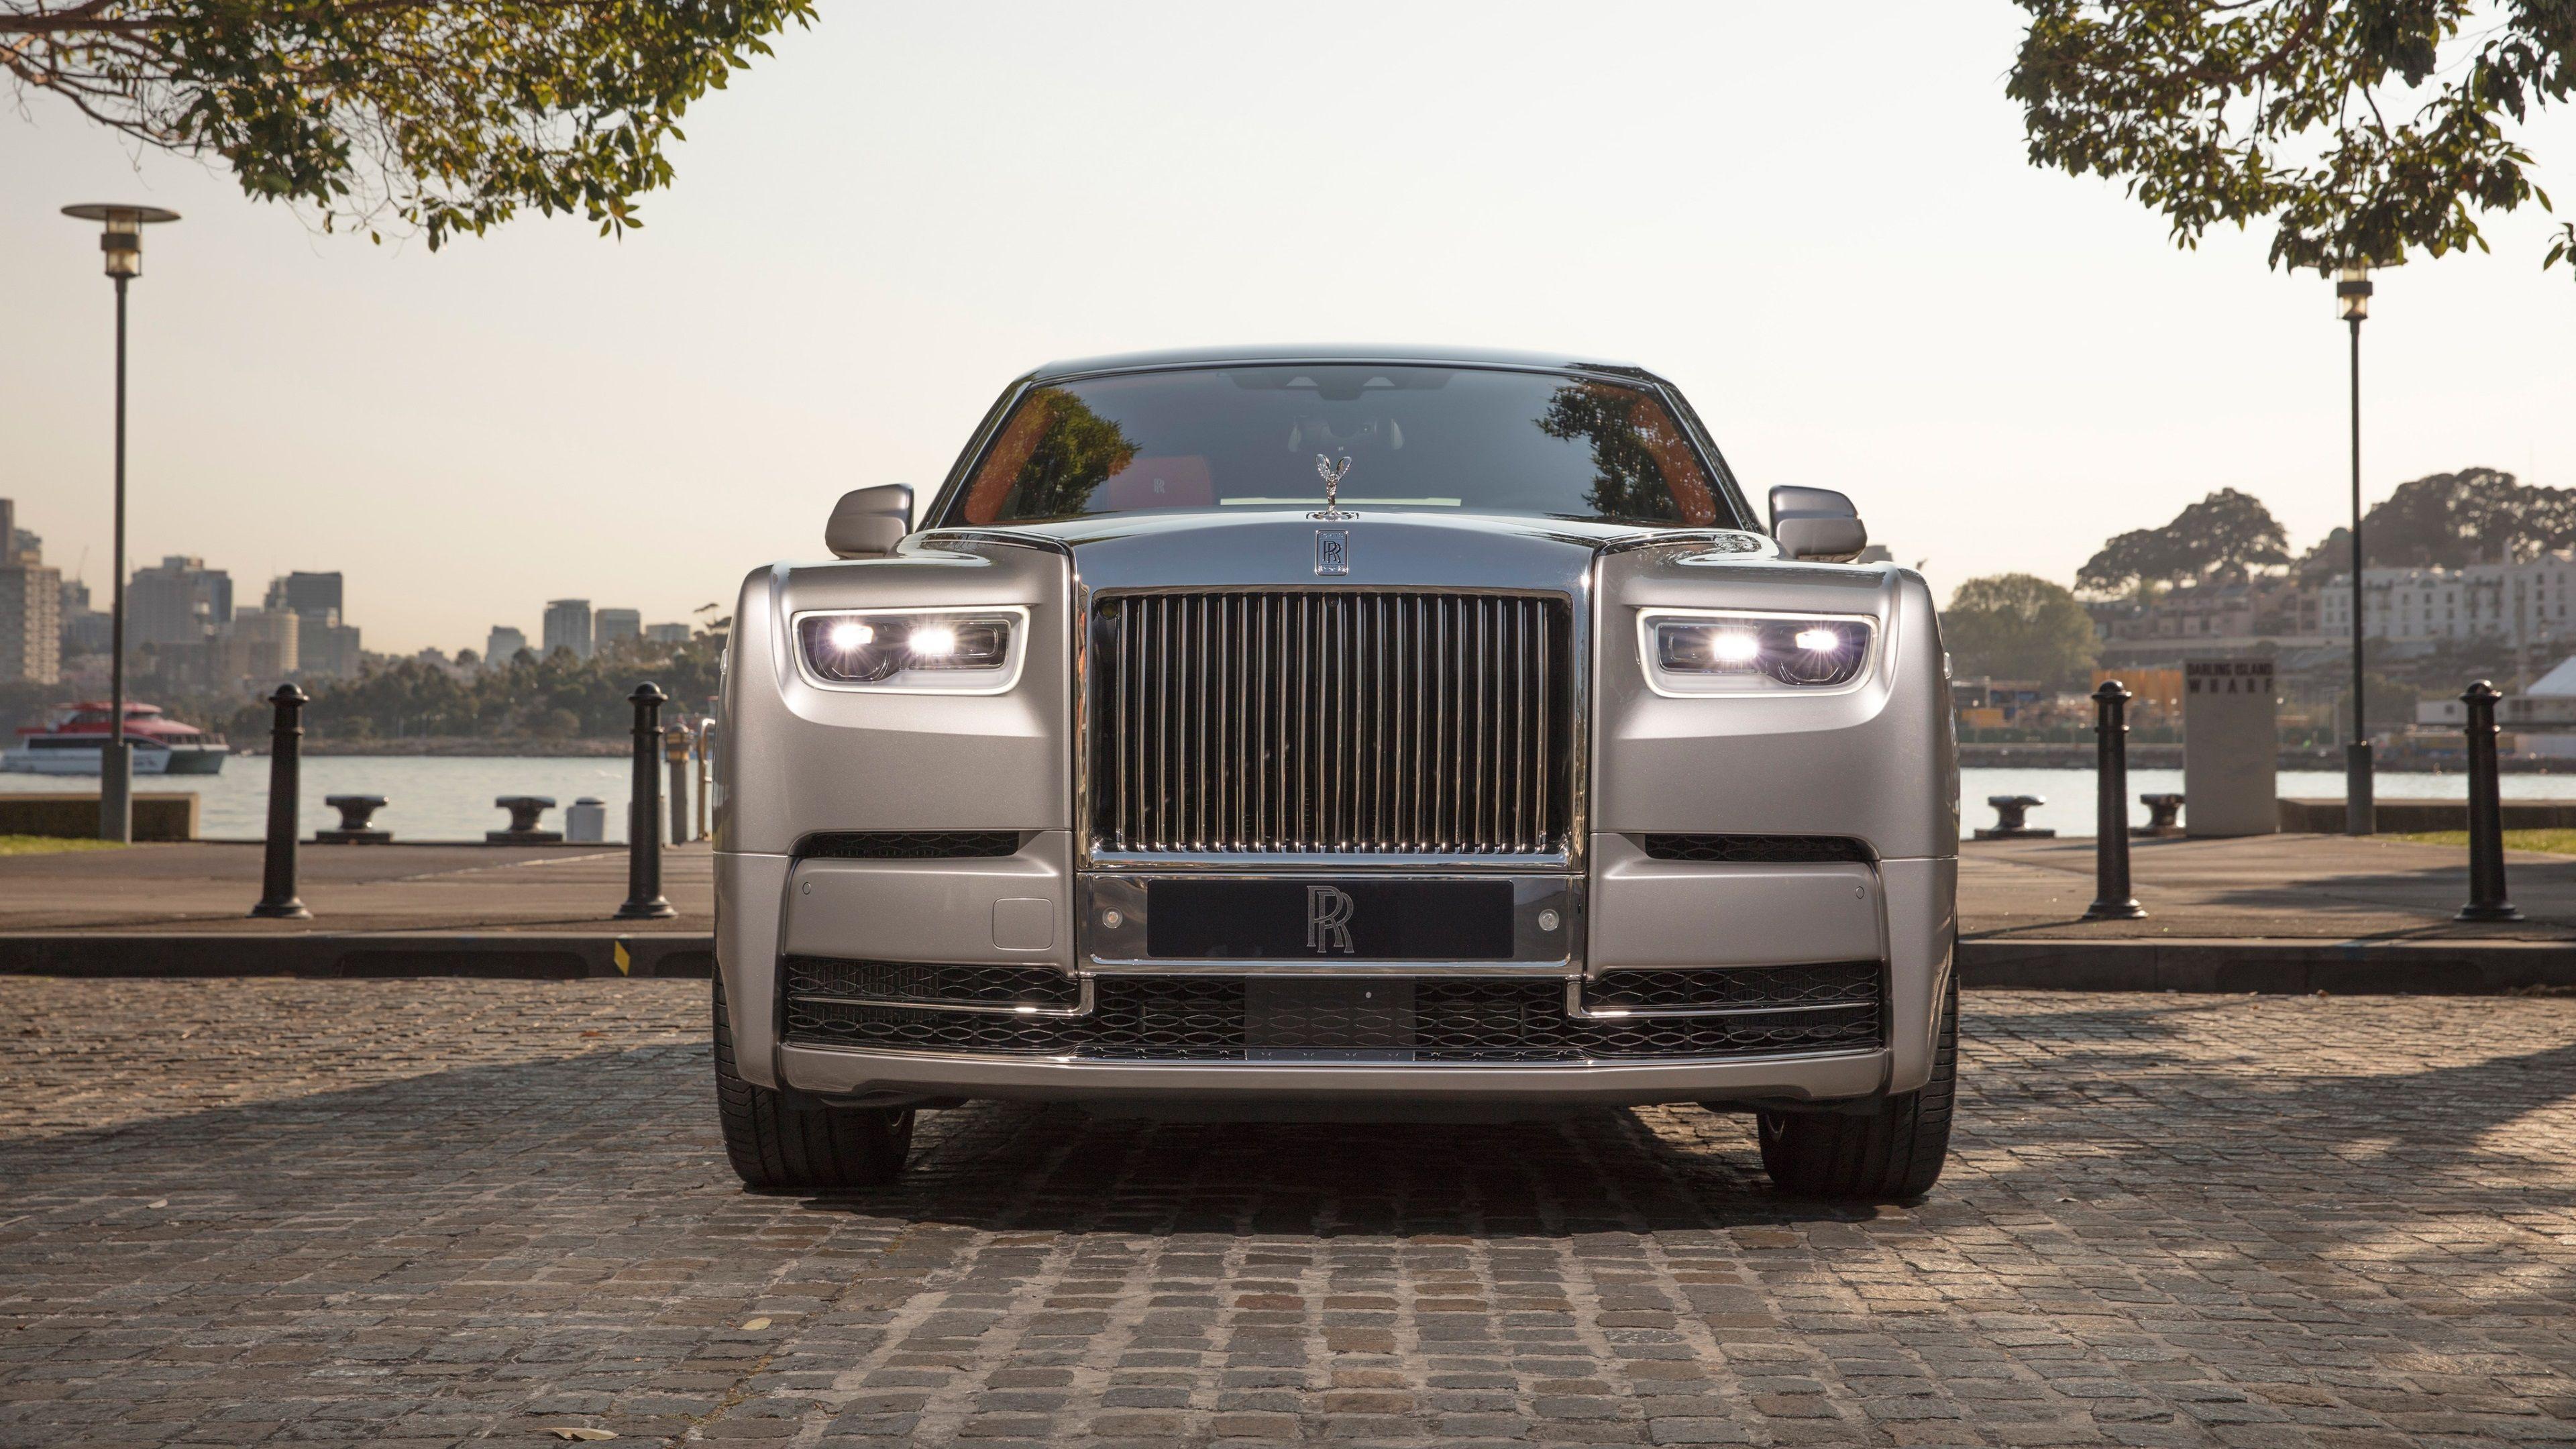 3840x2160 Rolls Royce Phantom 4k Full Hd Wallpaper Rolls Royce Phantom Rolls Royce Royce